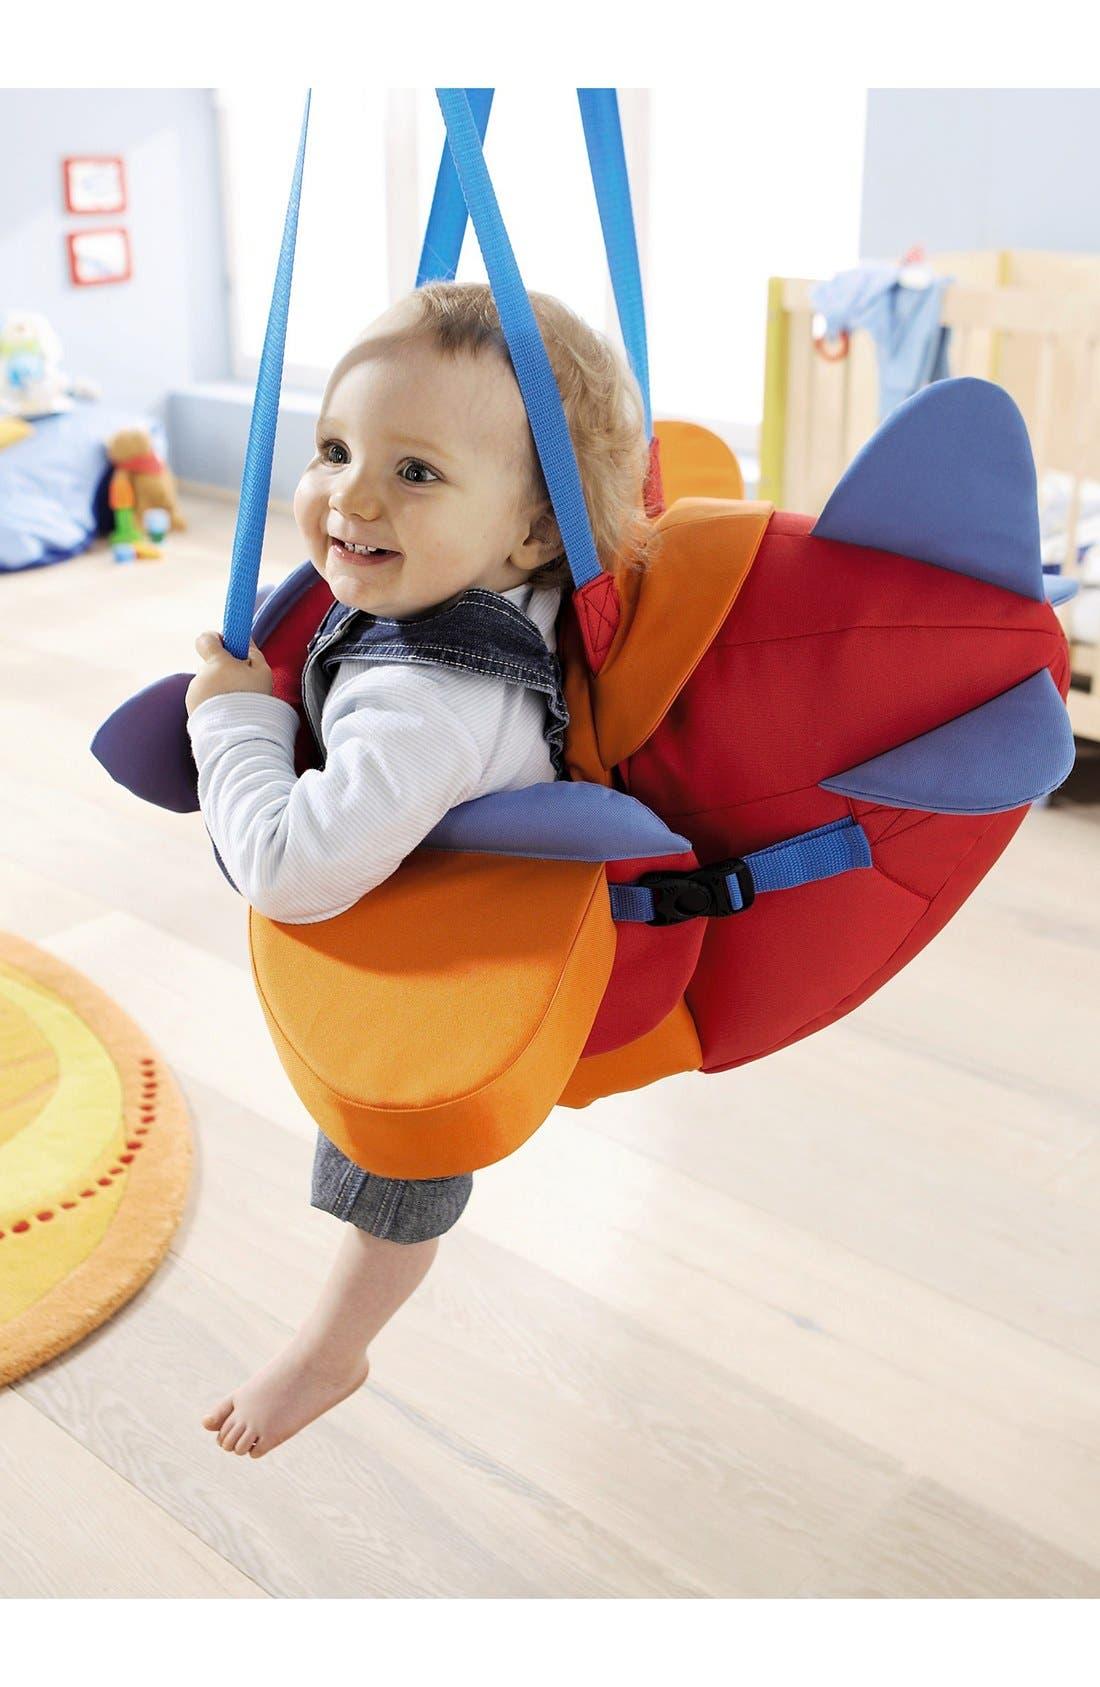 HABA,                             Aircraft Baby Swing,                             Alternate thumbnail 3, color,                             600